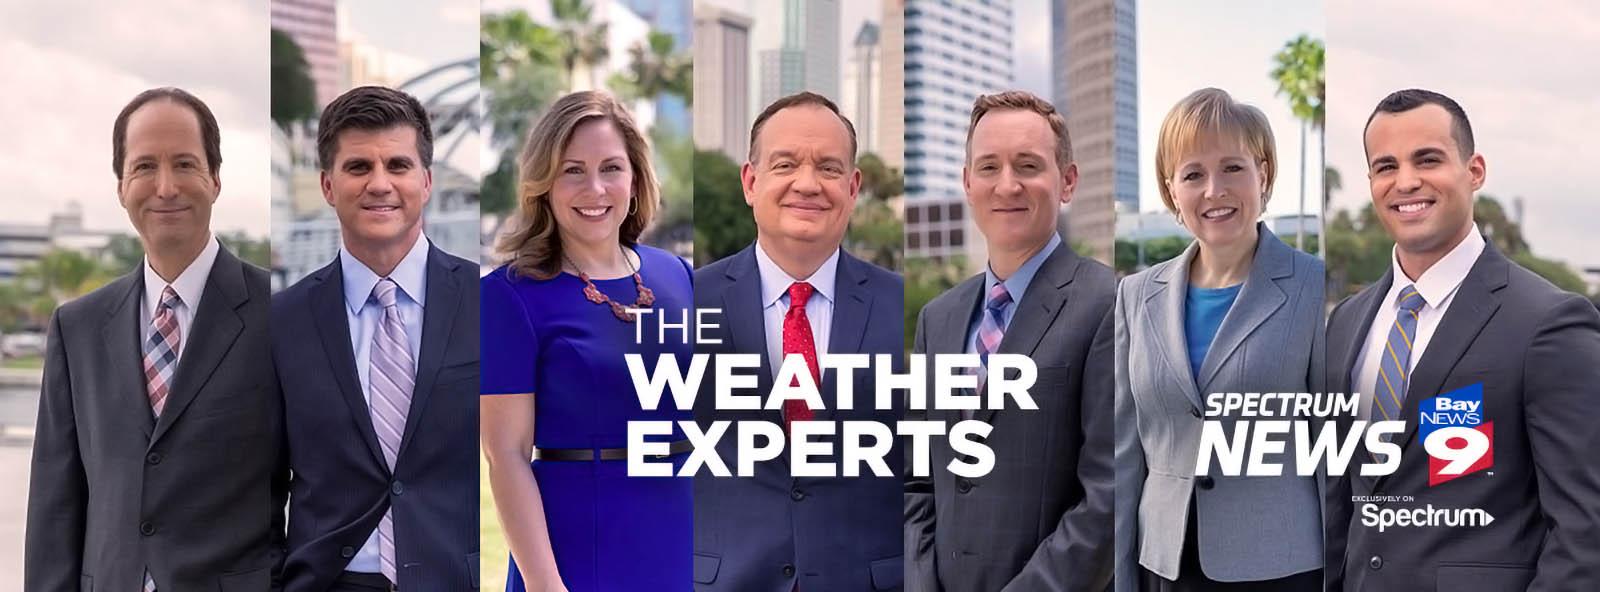 Spectrum Bay News 9 St. Petersburgh weather team